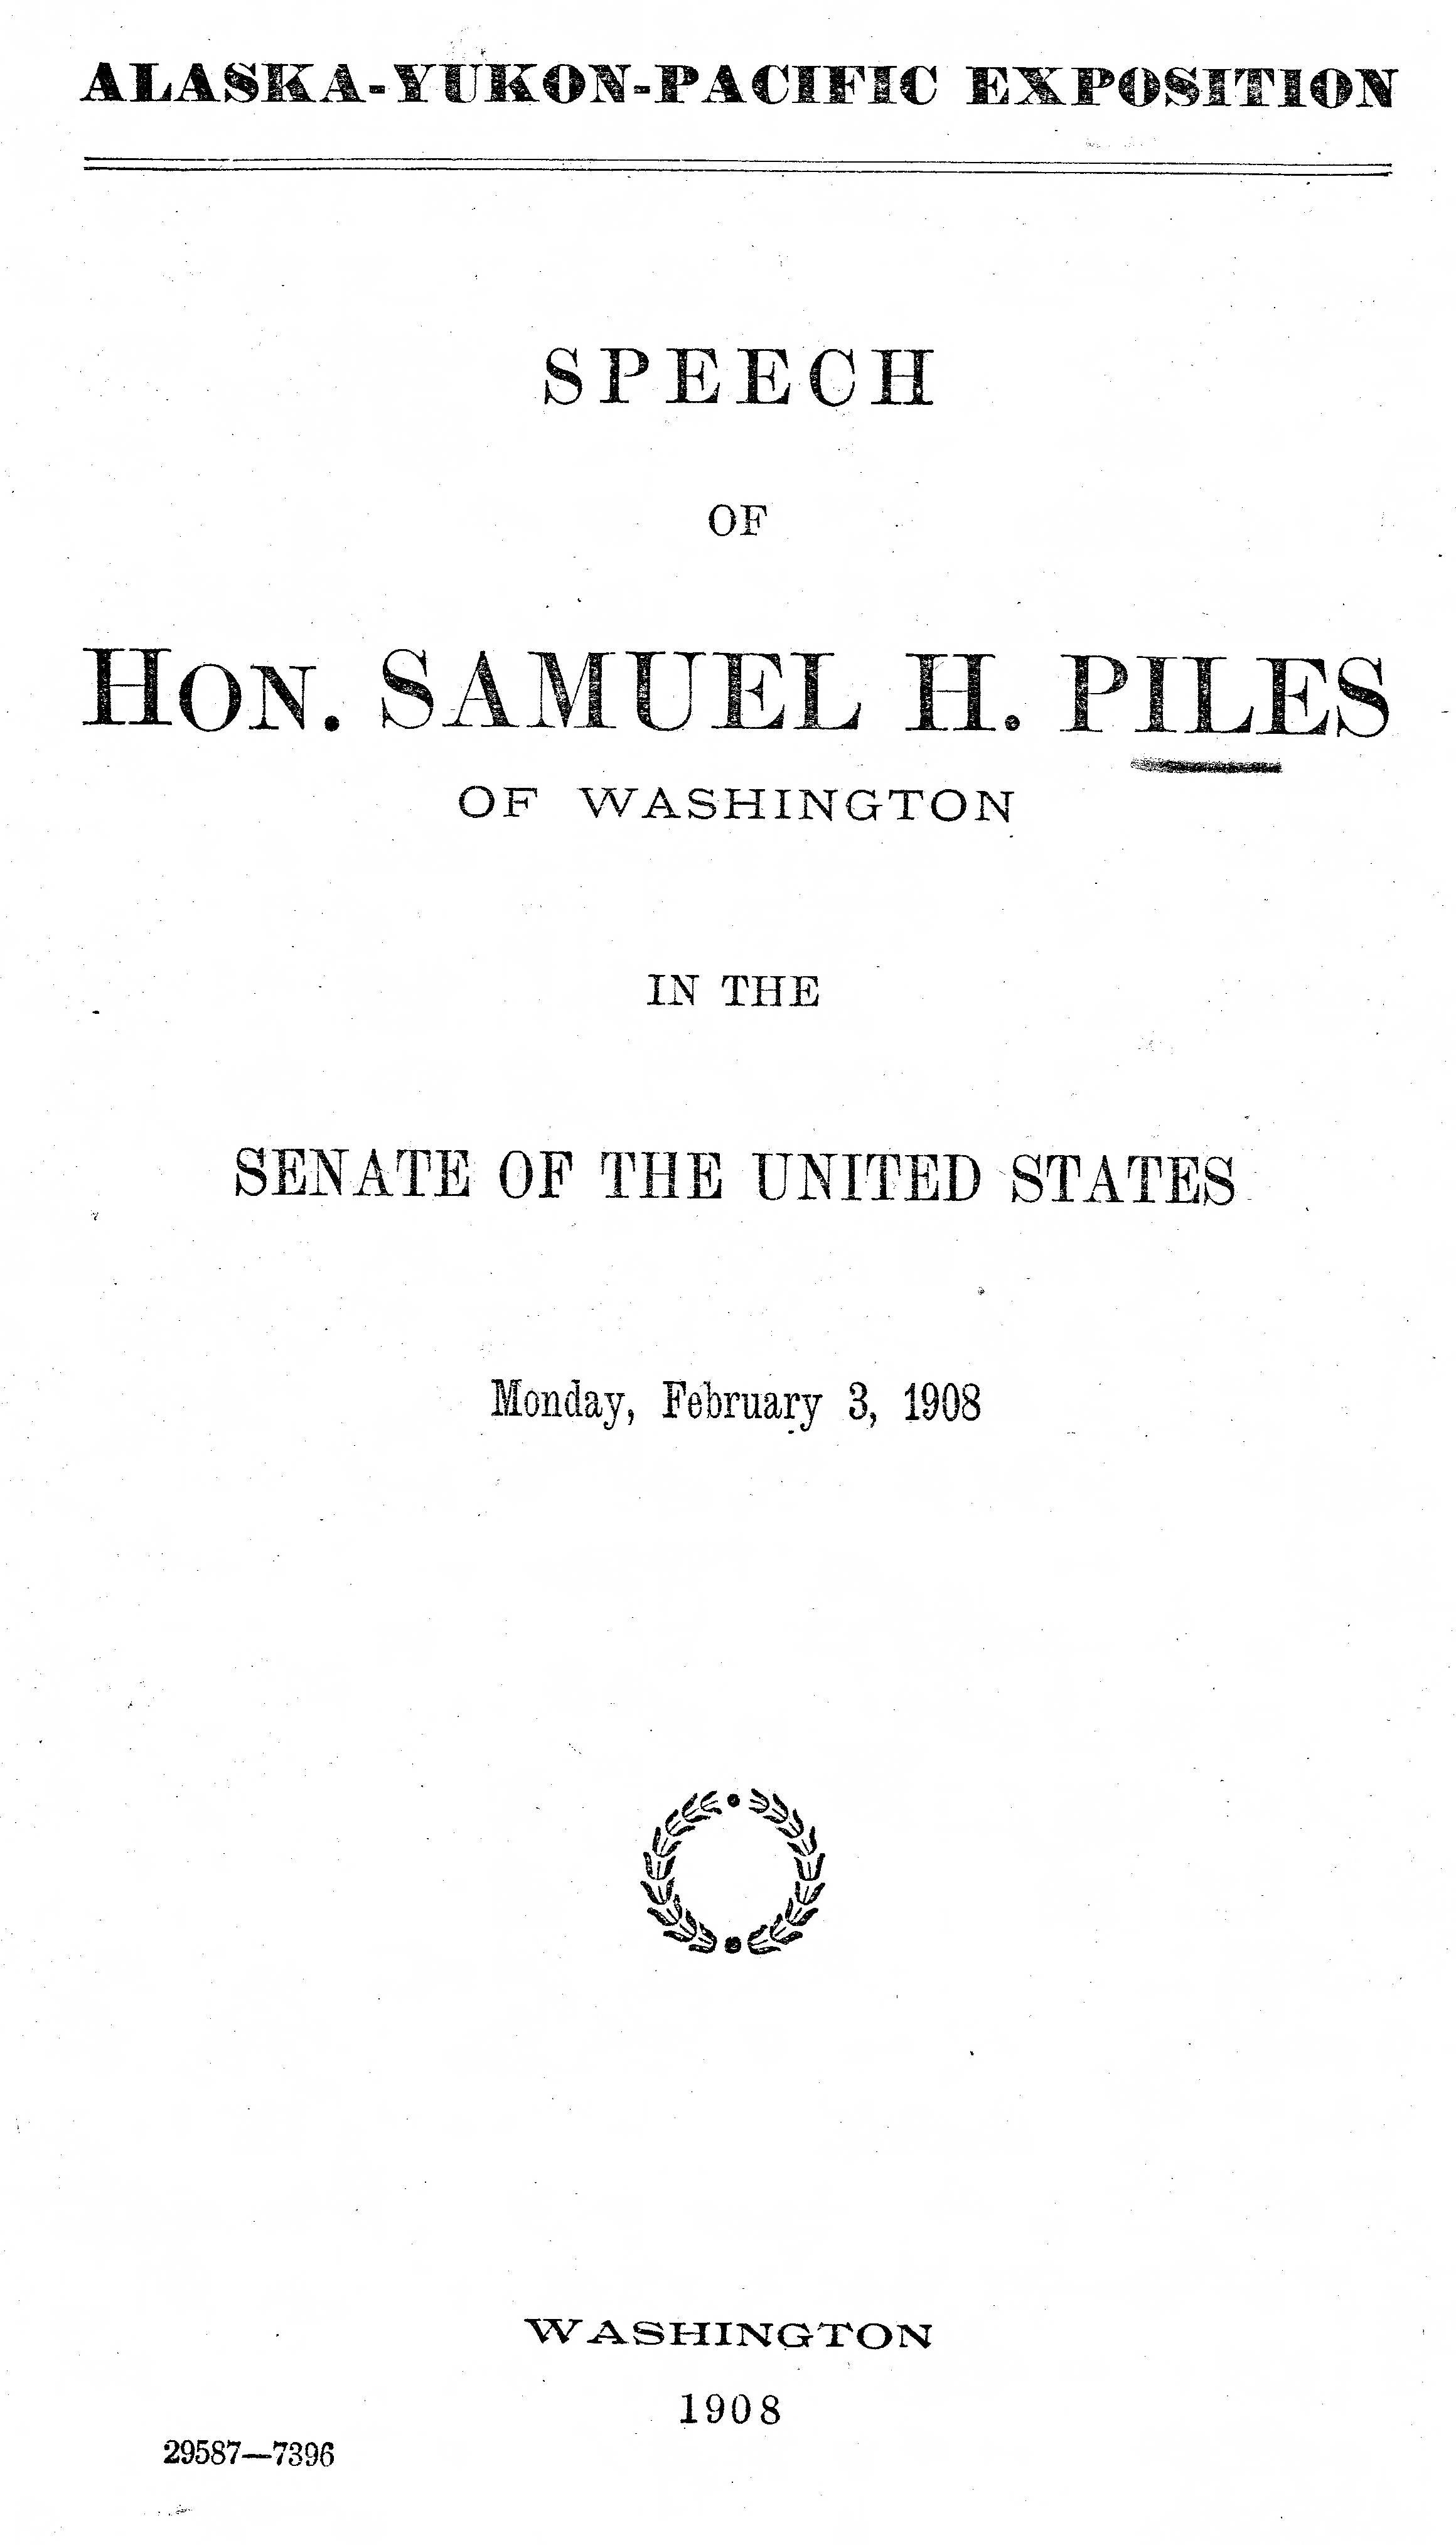 Alaska-Yukon-Pacific Exposition: speech of Hon. Samuel H. Piles of Washington in the Senate of the United States: Monday, February 3, 1908